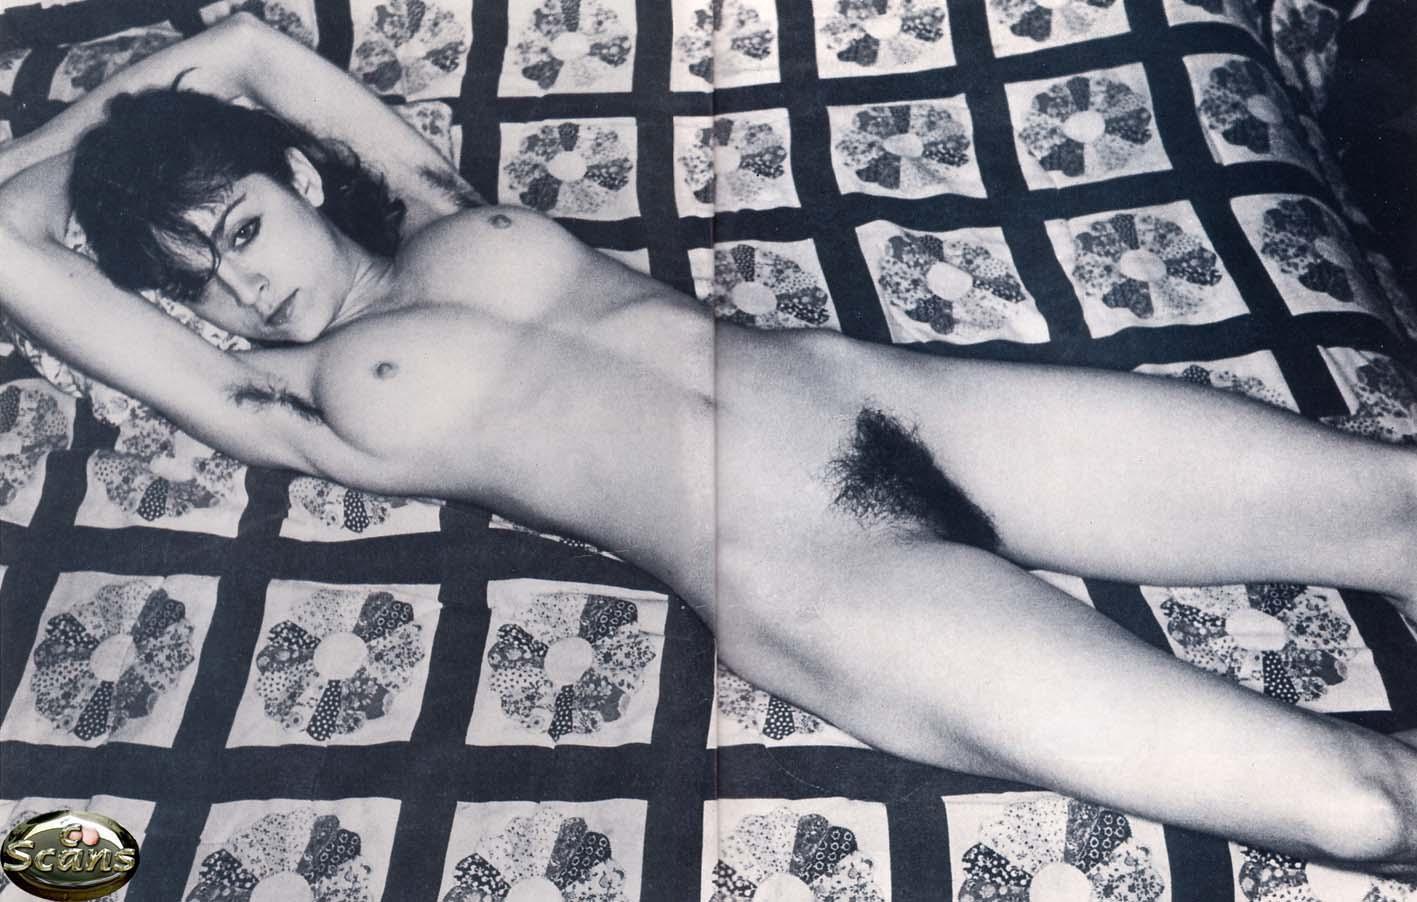 Turns! madonna 1979 nude photo apologise